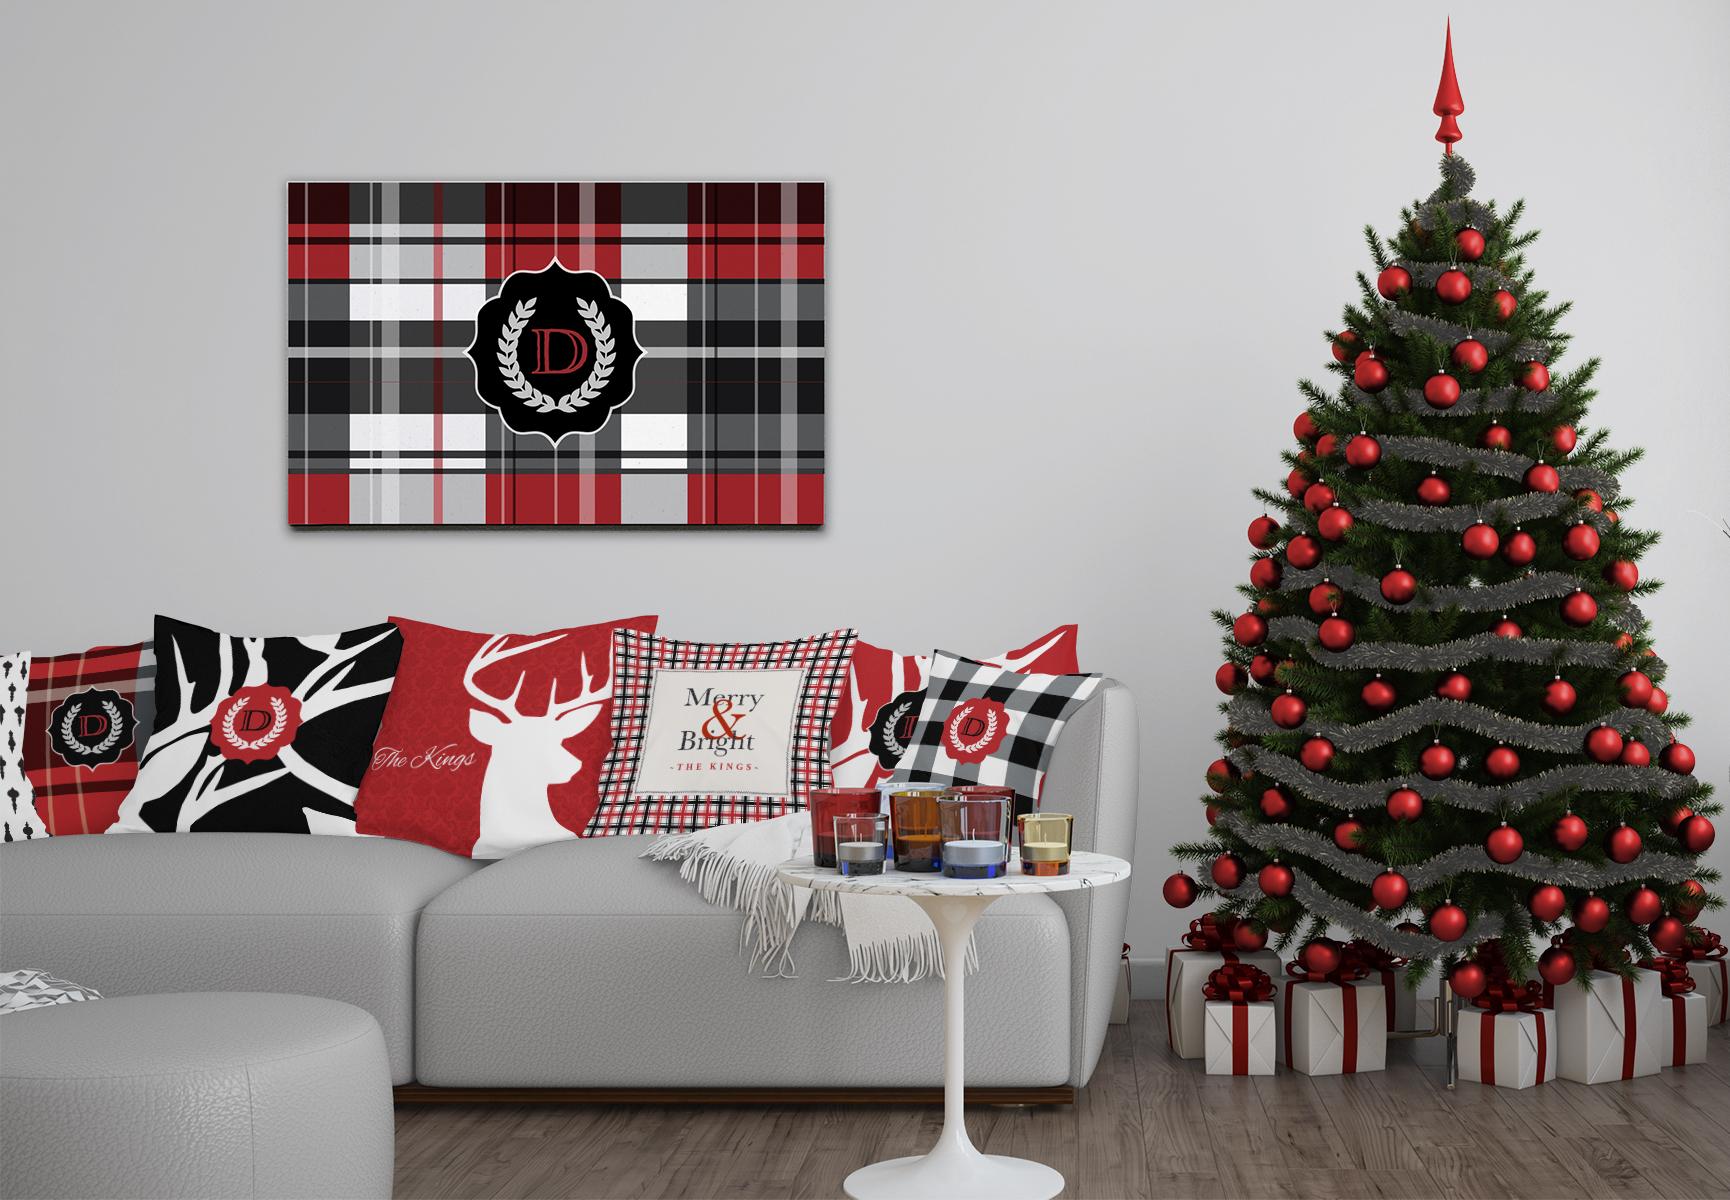 lbchristmas-pillow-mockup-crop-sm.jpg